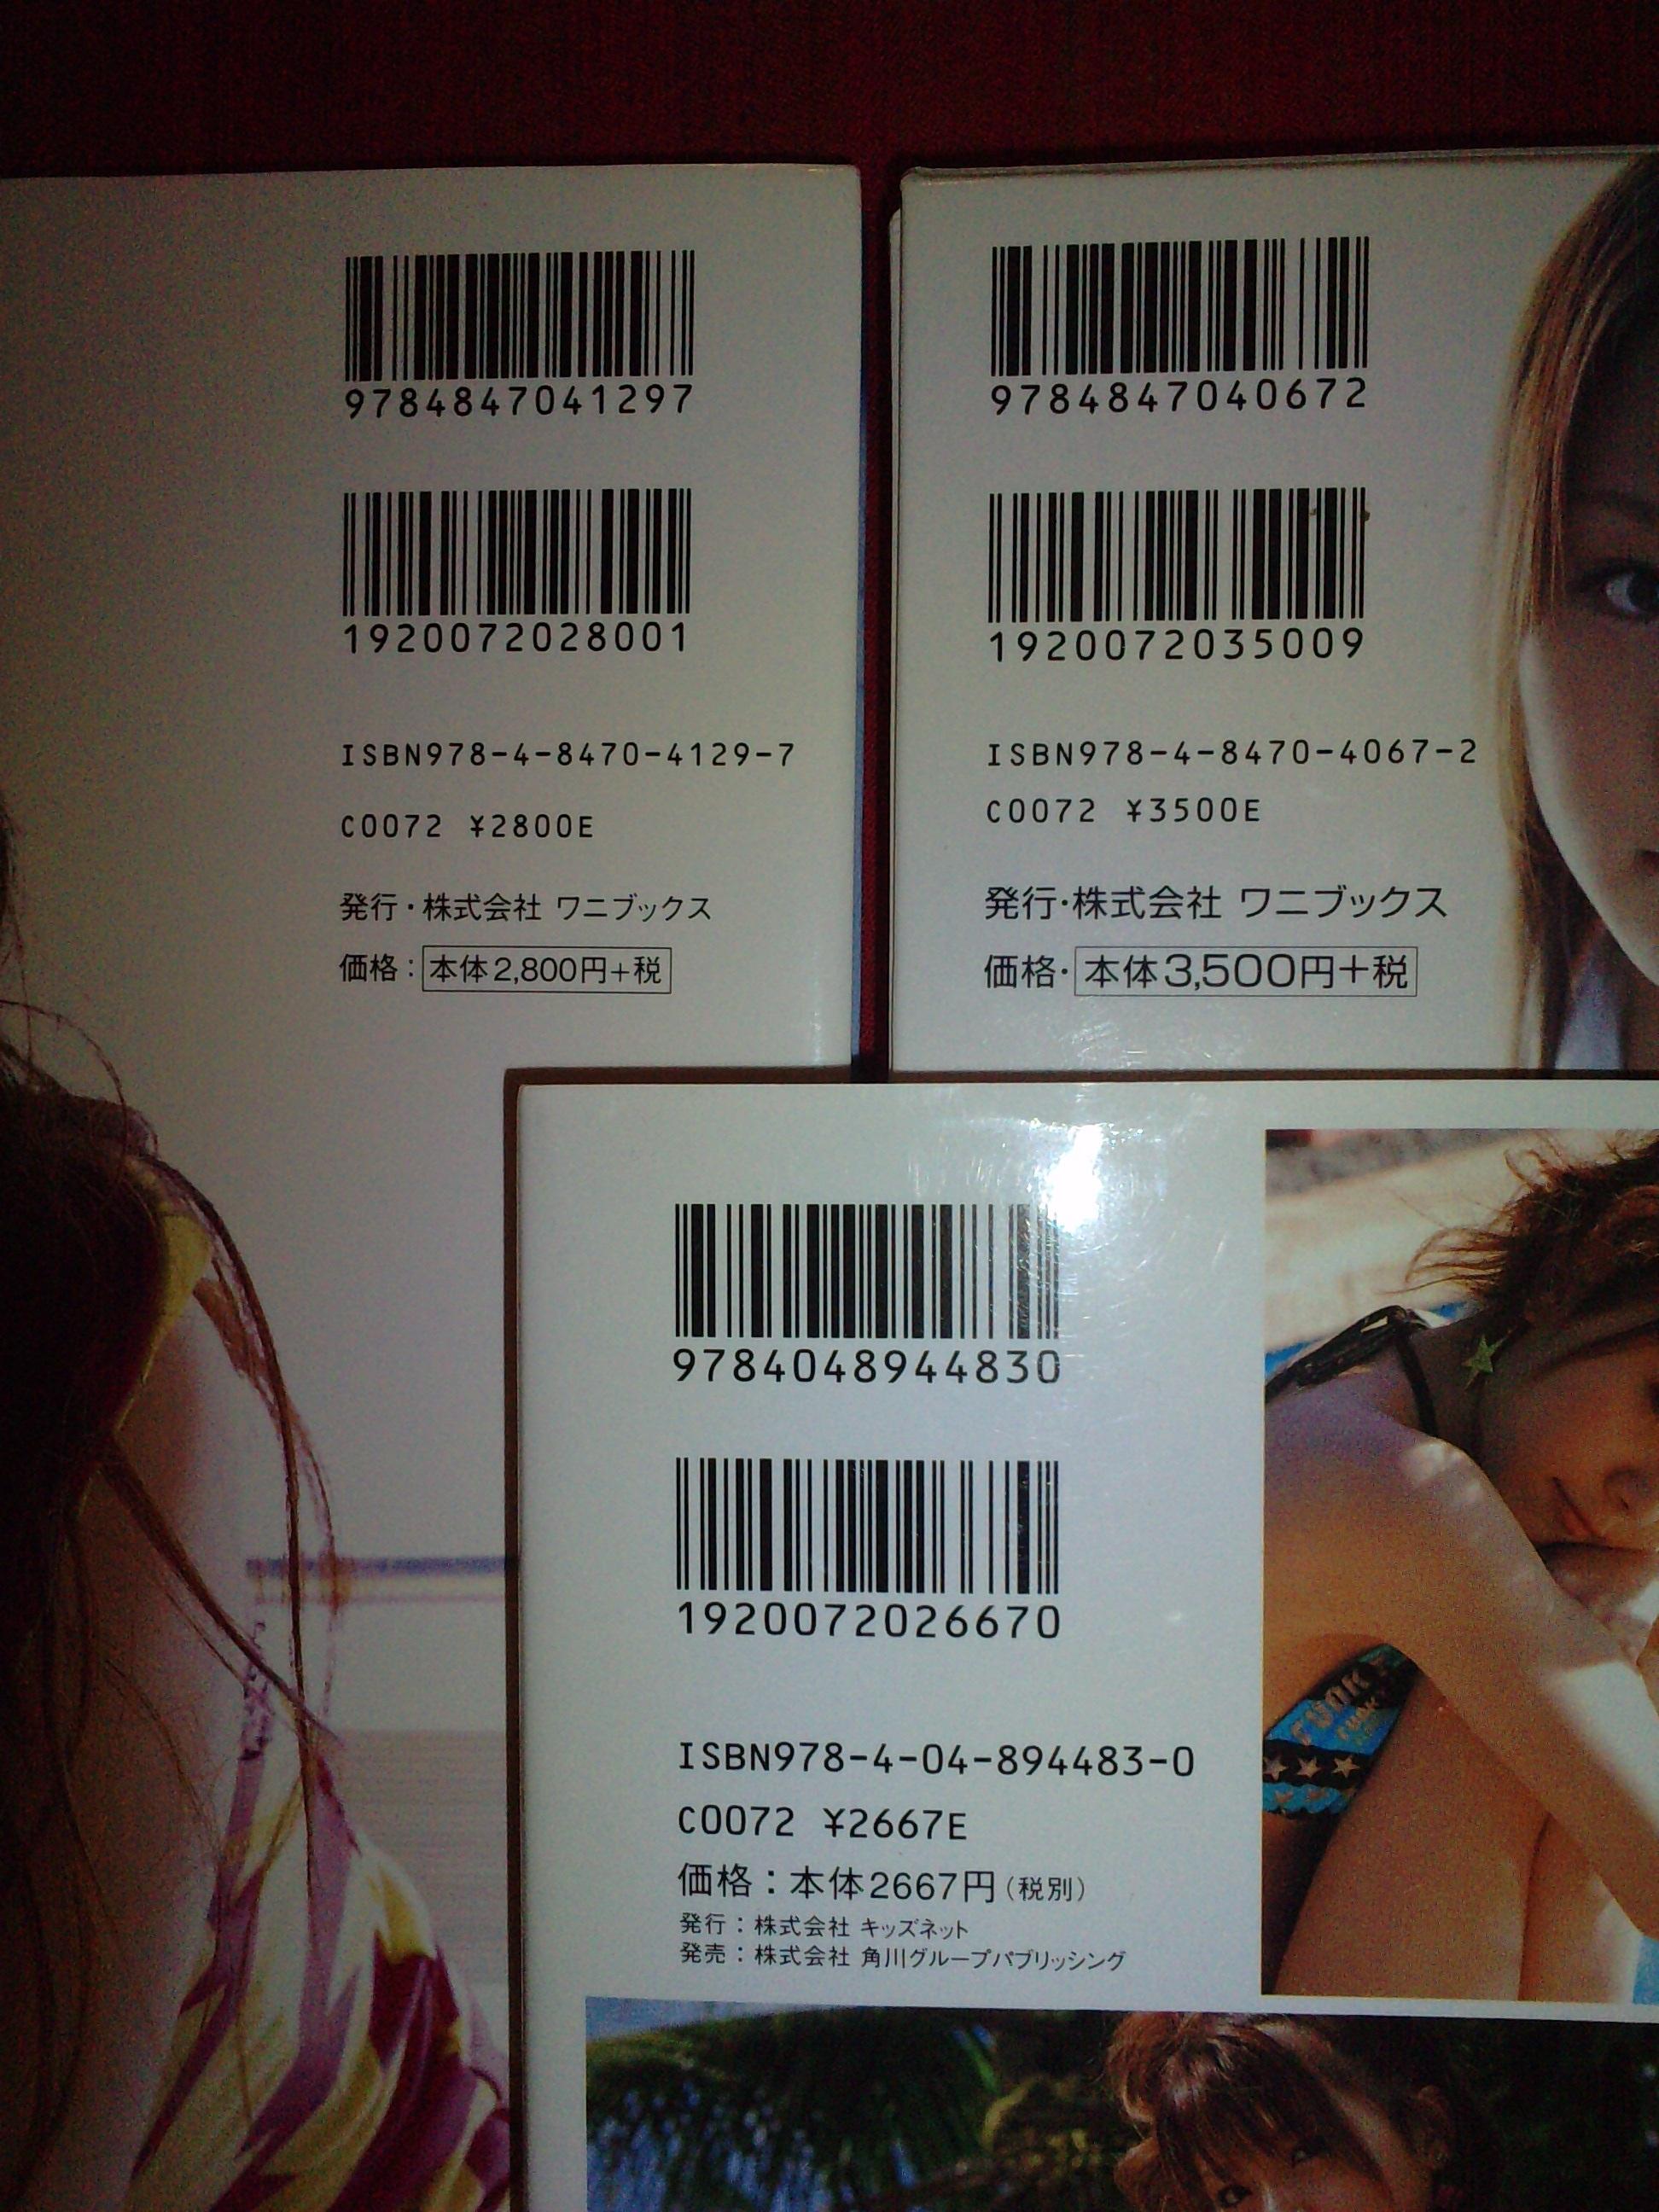 3 ISBN barcodes in Japan 20100927.jpg